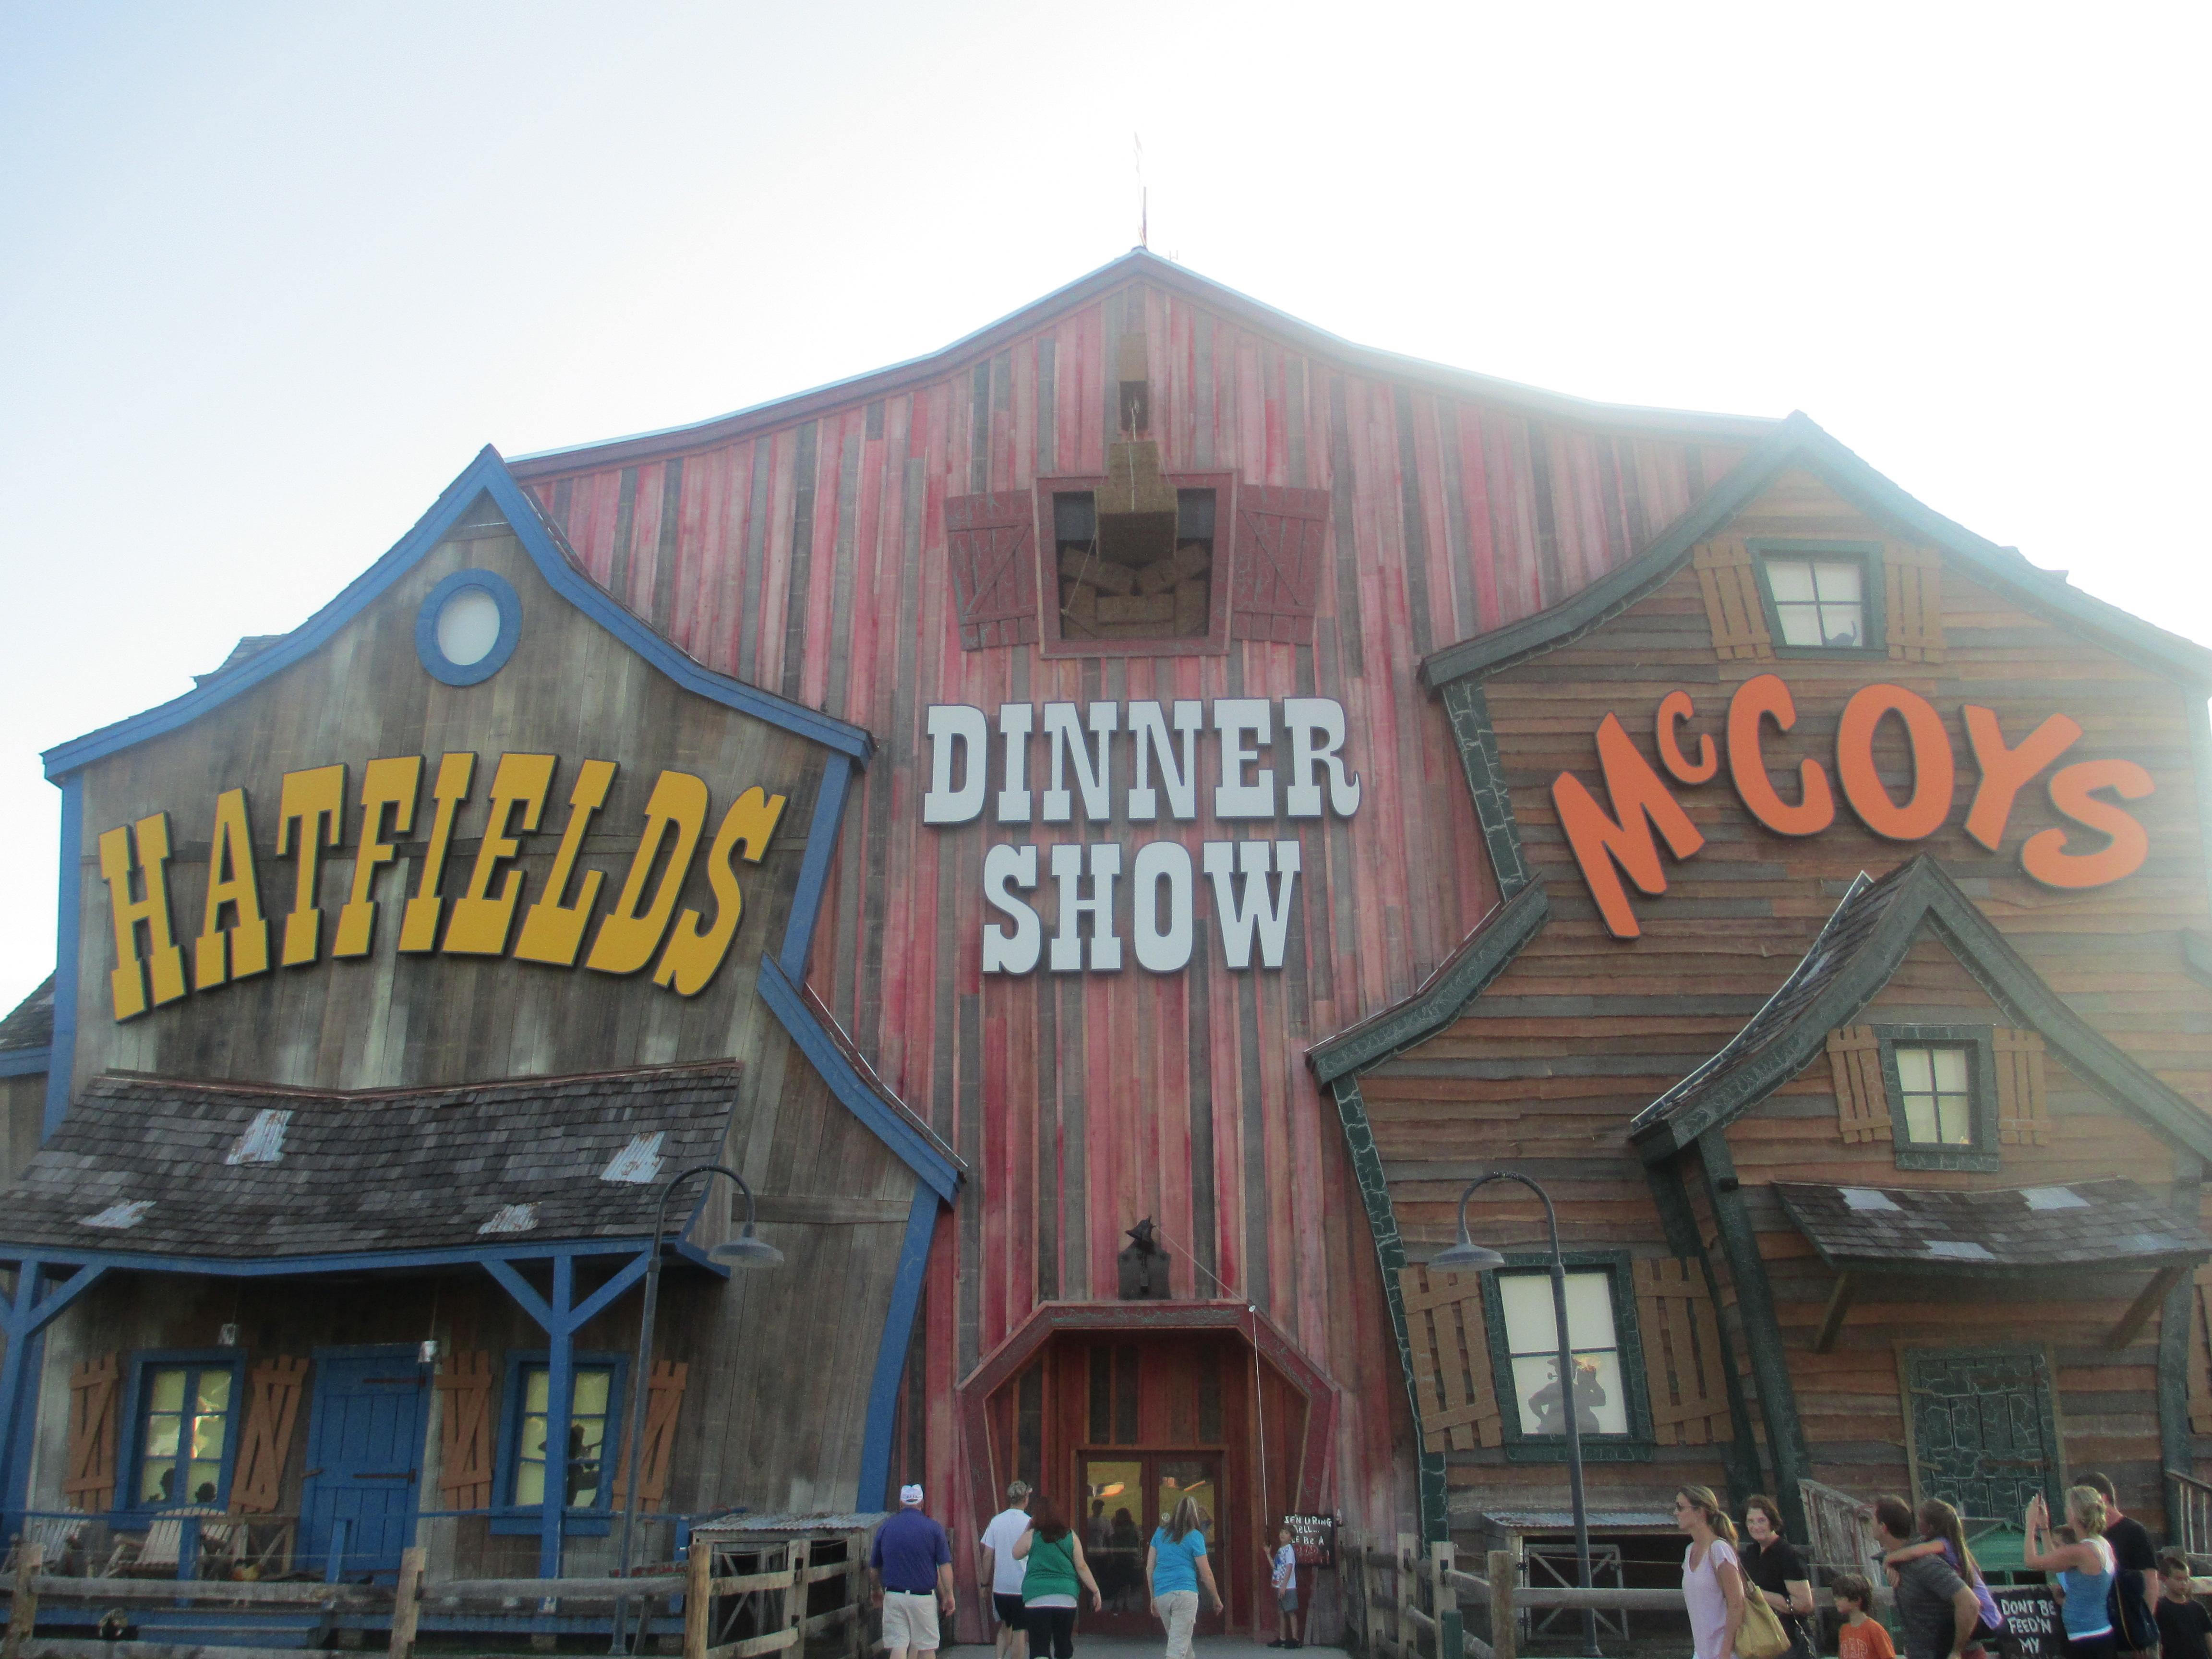 File:Hatfield & McCoy Dinner Show, Pigeon Forge, TN IMG 5042.JPG